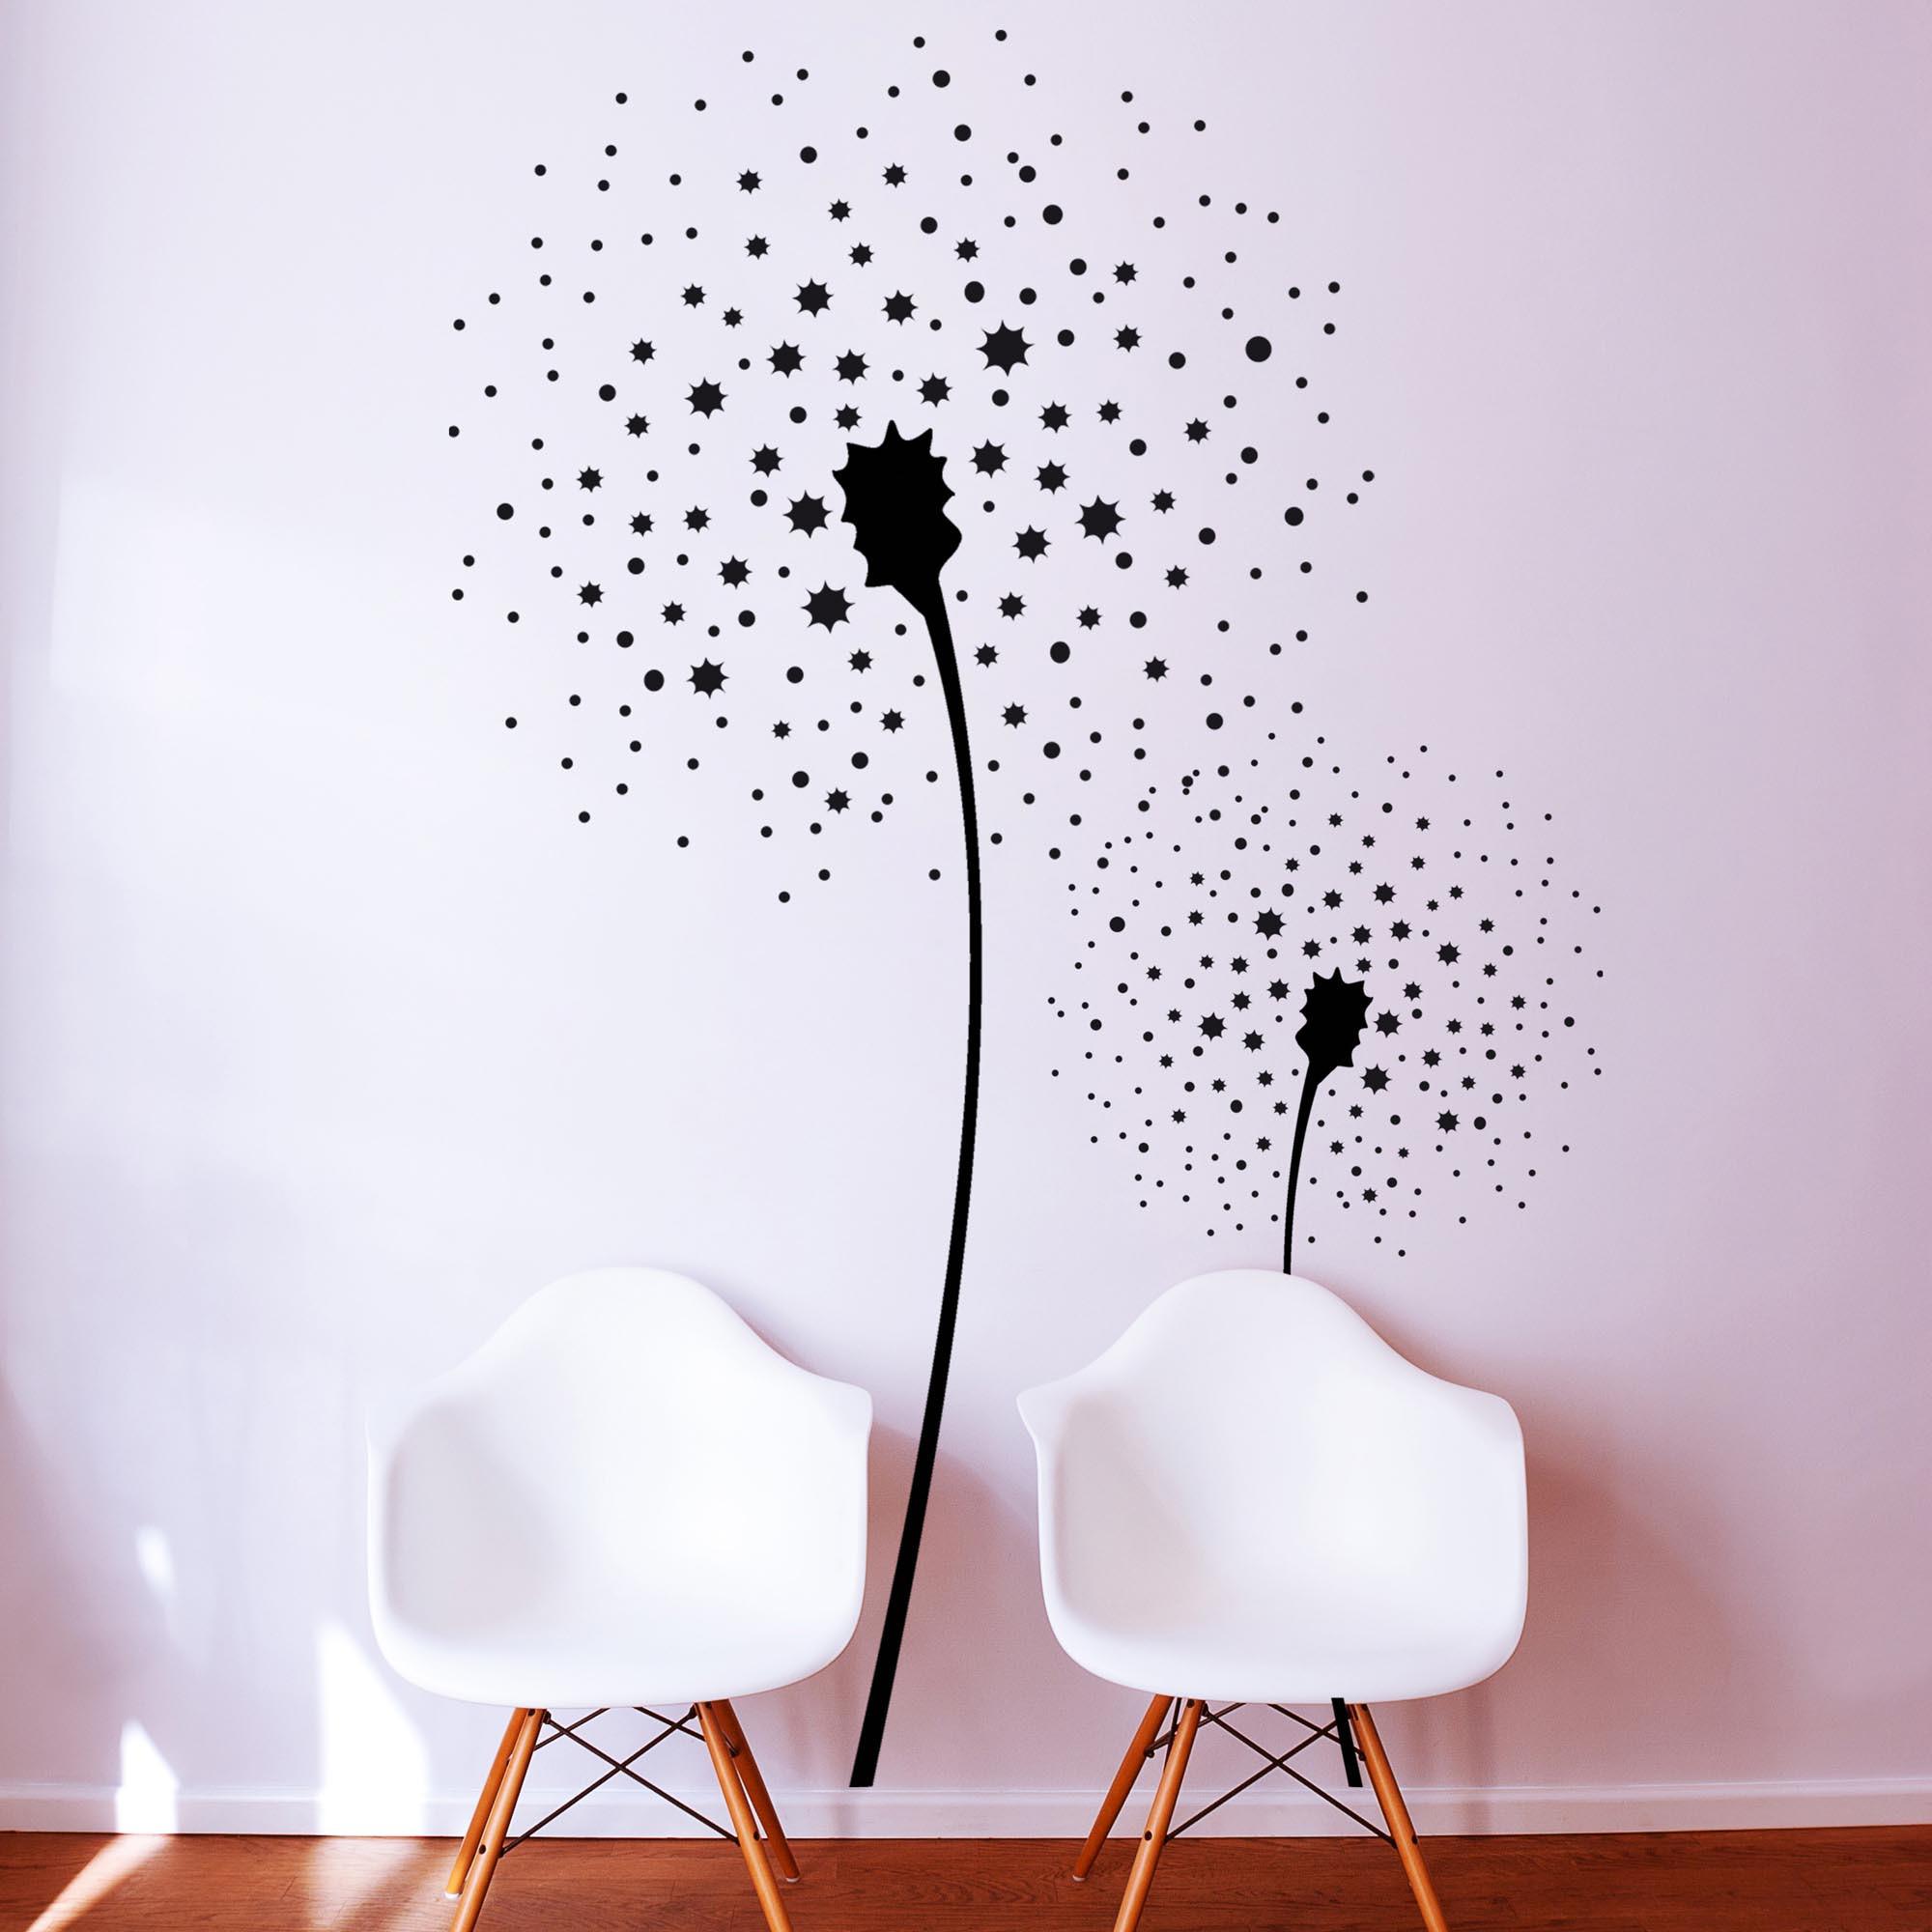 wandtattoo wandaufkleber pusteblume blume m763. Black Bedroom Furniture Sets. Home Design Ideas